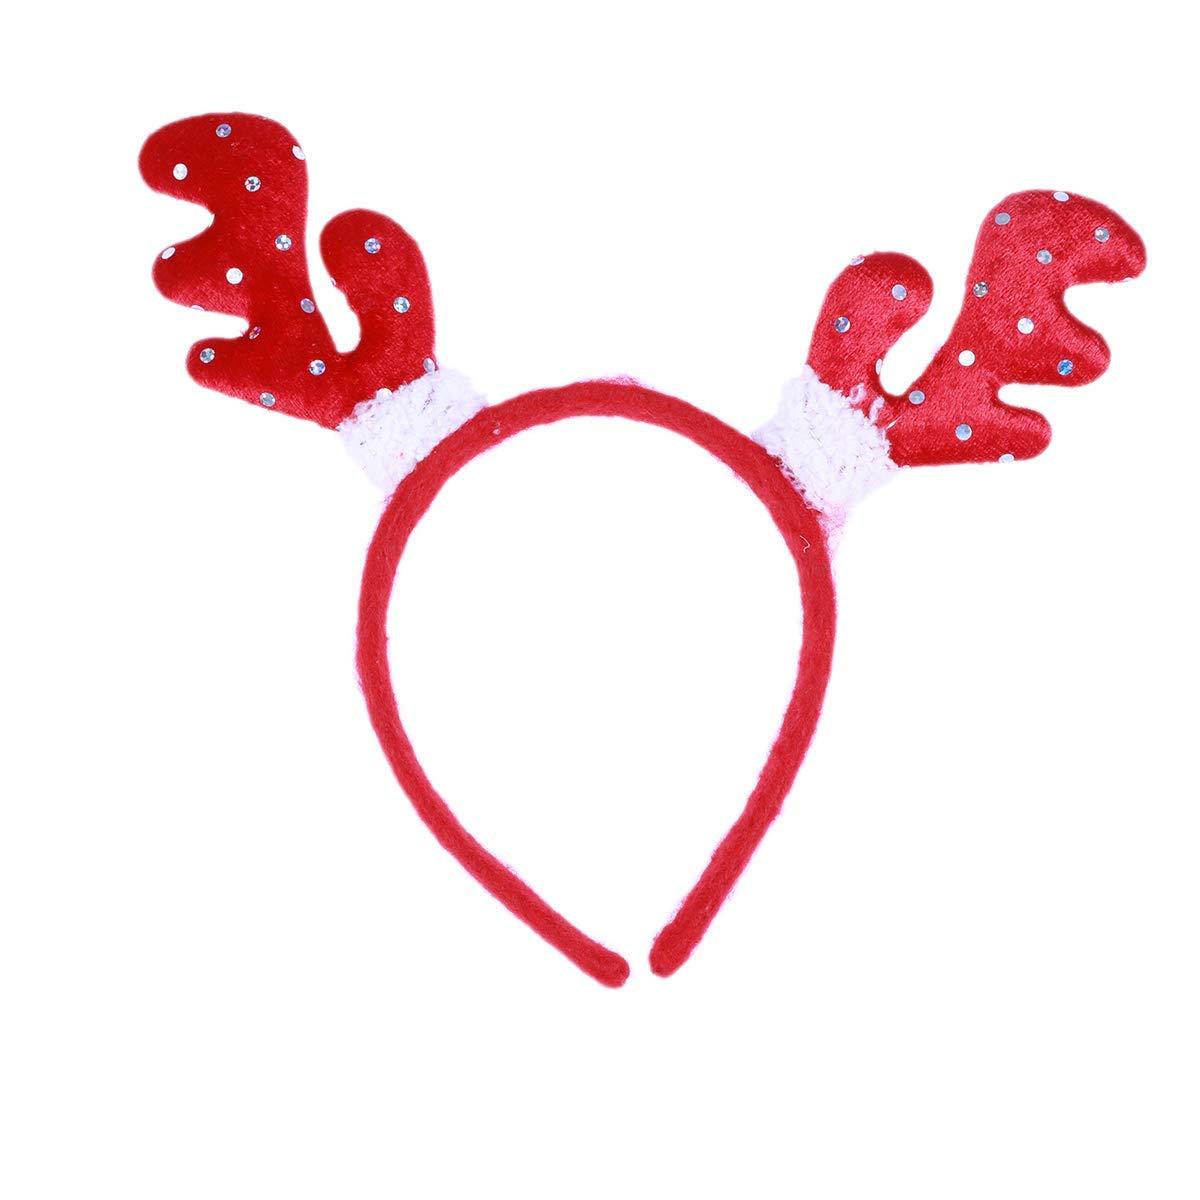 Toyvian Reindeer Antler Hair Hoop Red Adjustable Headband Headwear Christmas, Costume Party, Cosplay, Halloween and Masquerade